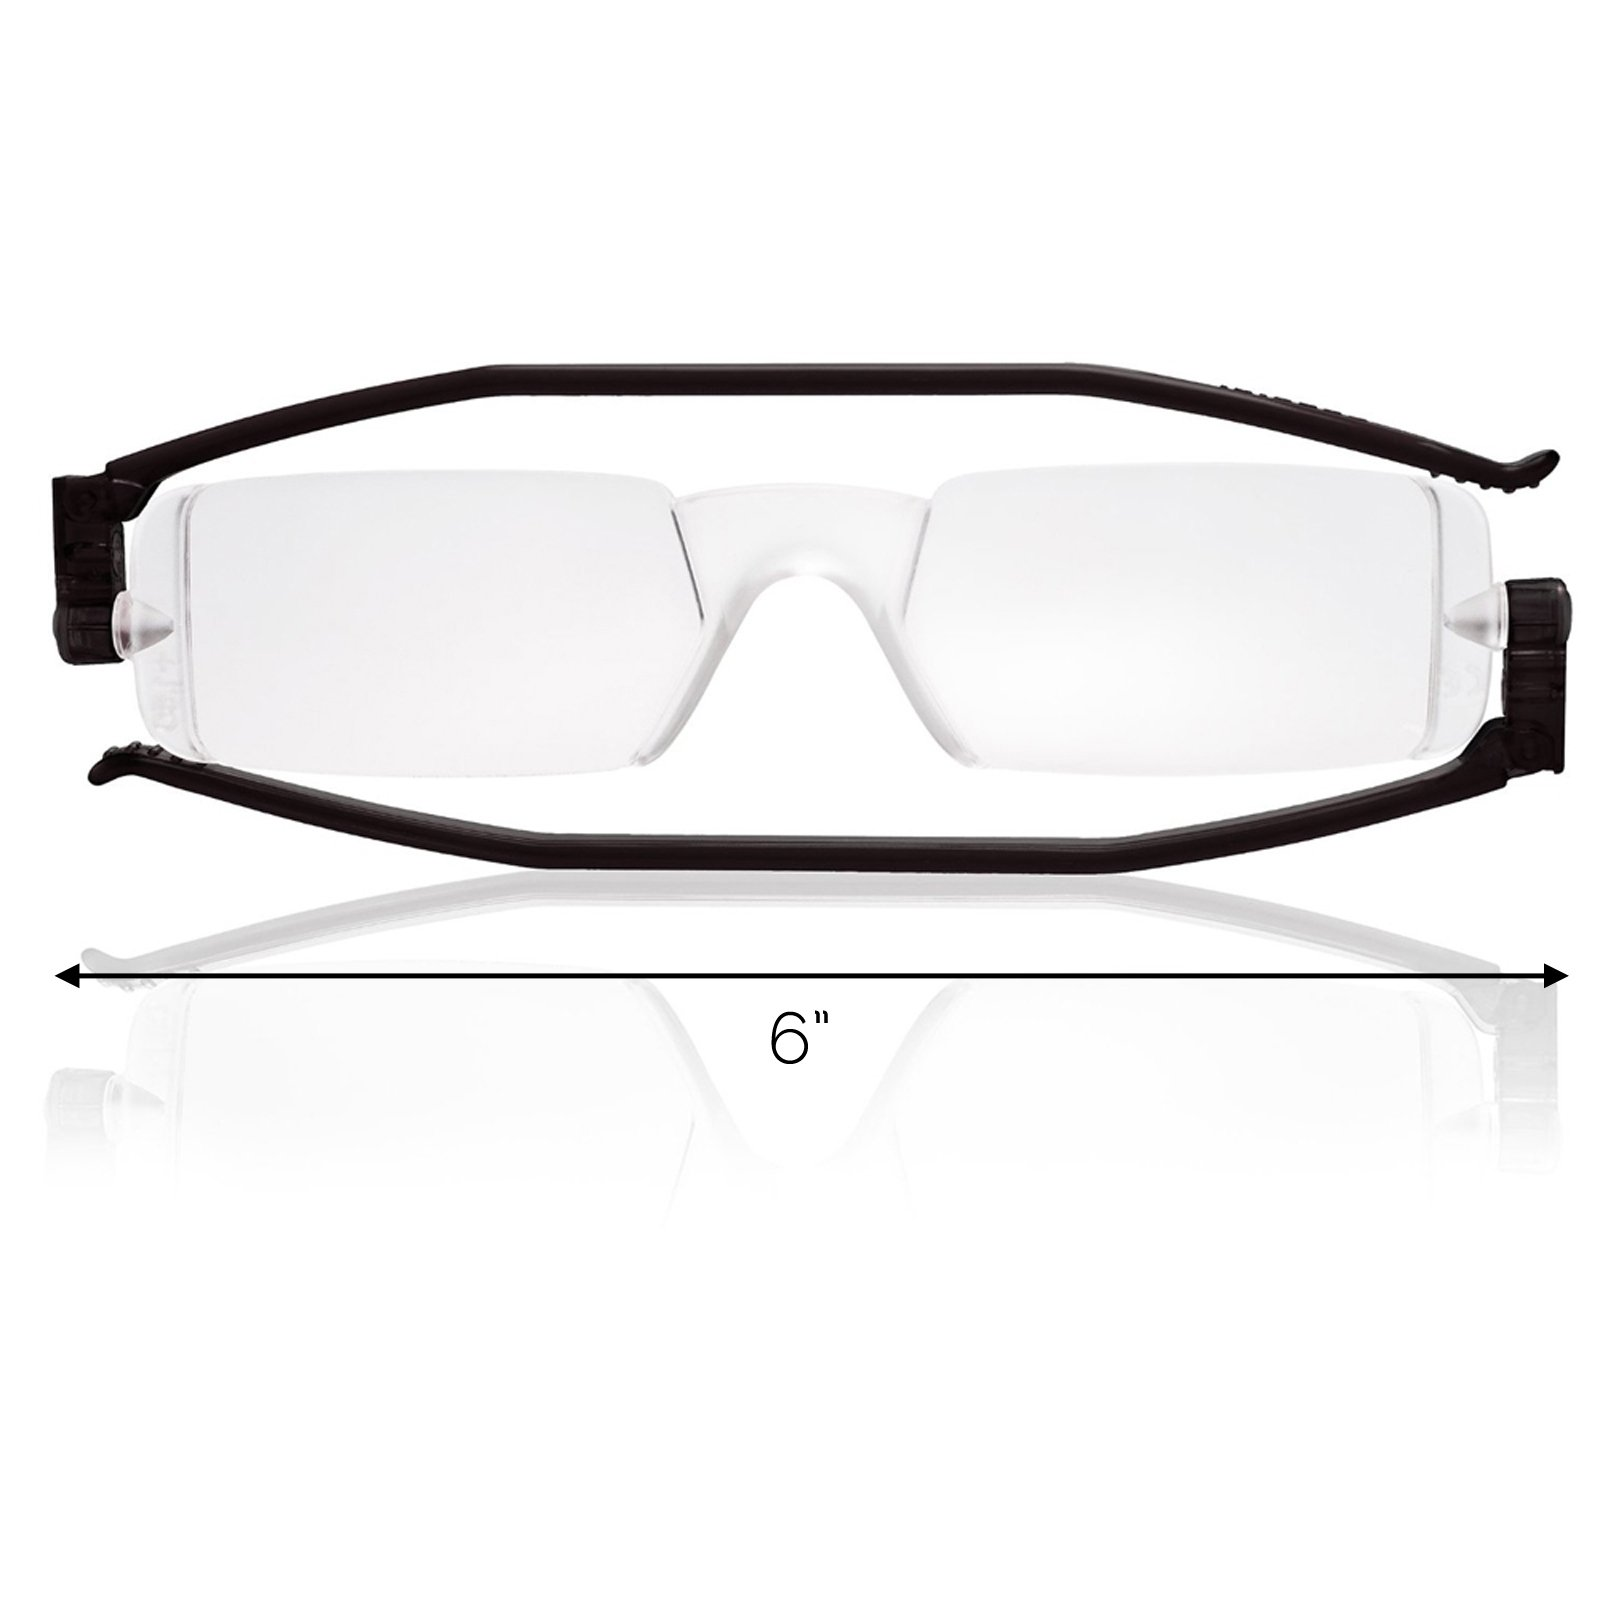 Reading Glasses Nannini Italy Vision Care Unisex Ultra Thin Readers - Black 1.5